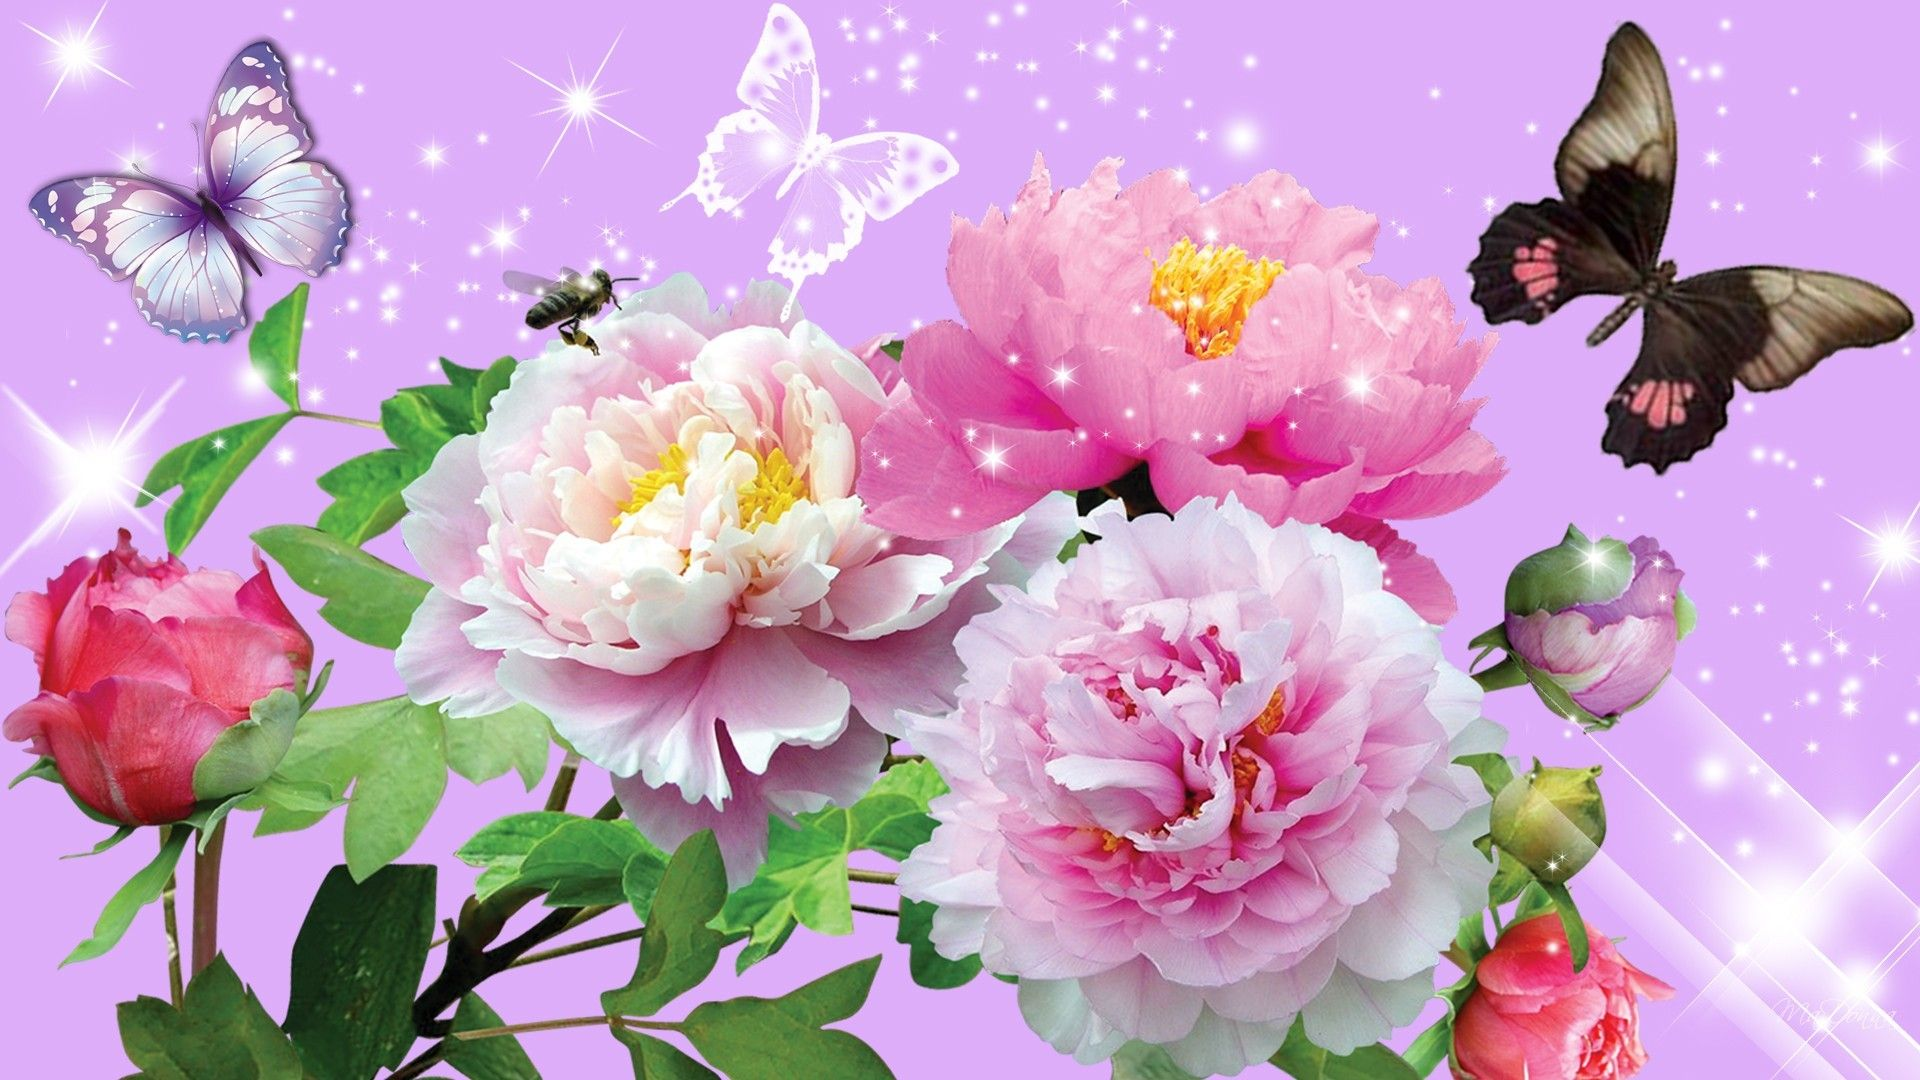 Imagine Me A Flower Flower Pictures Flower Wallpaper